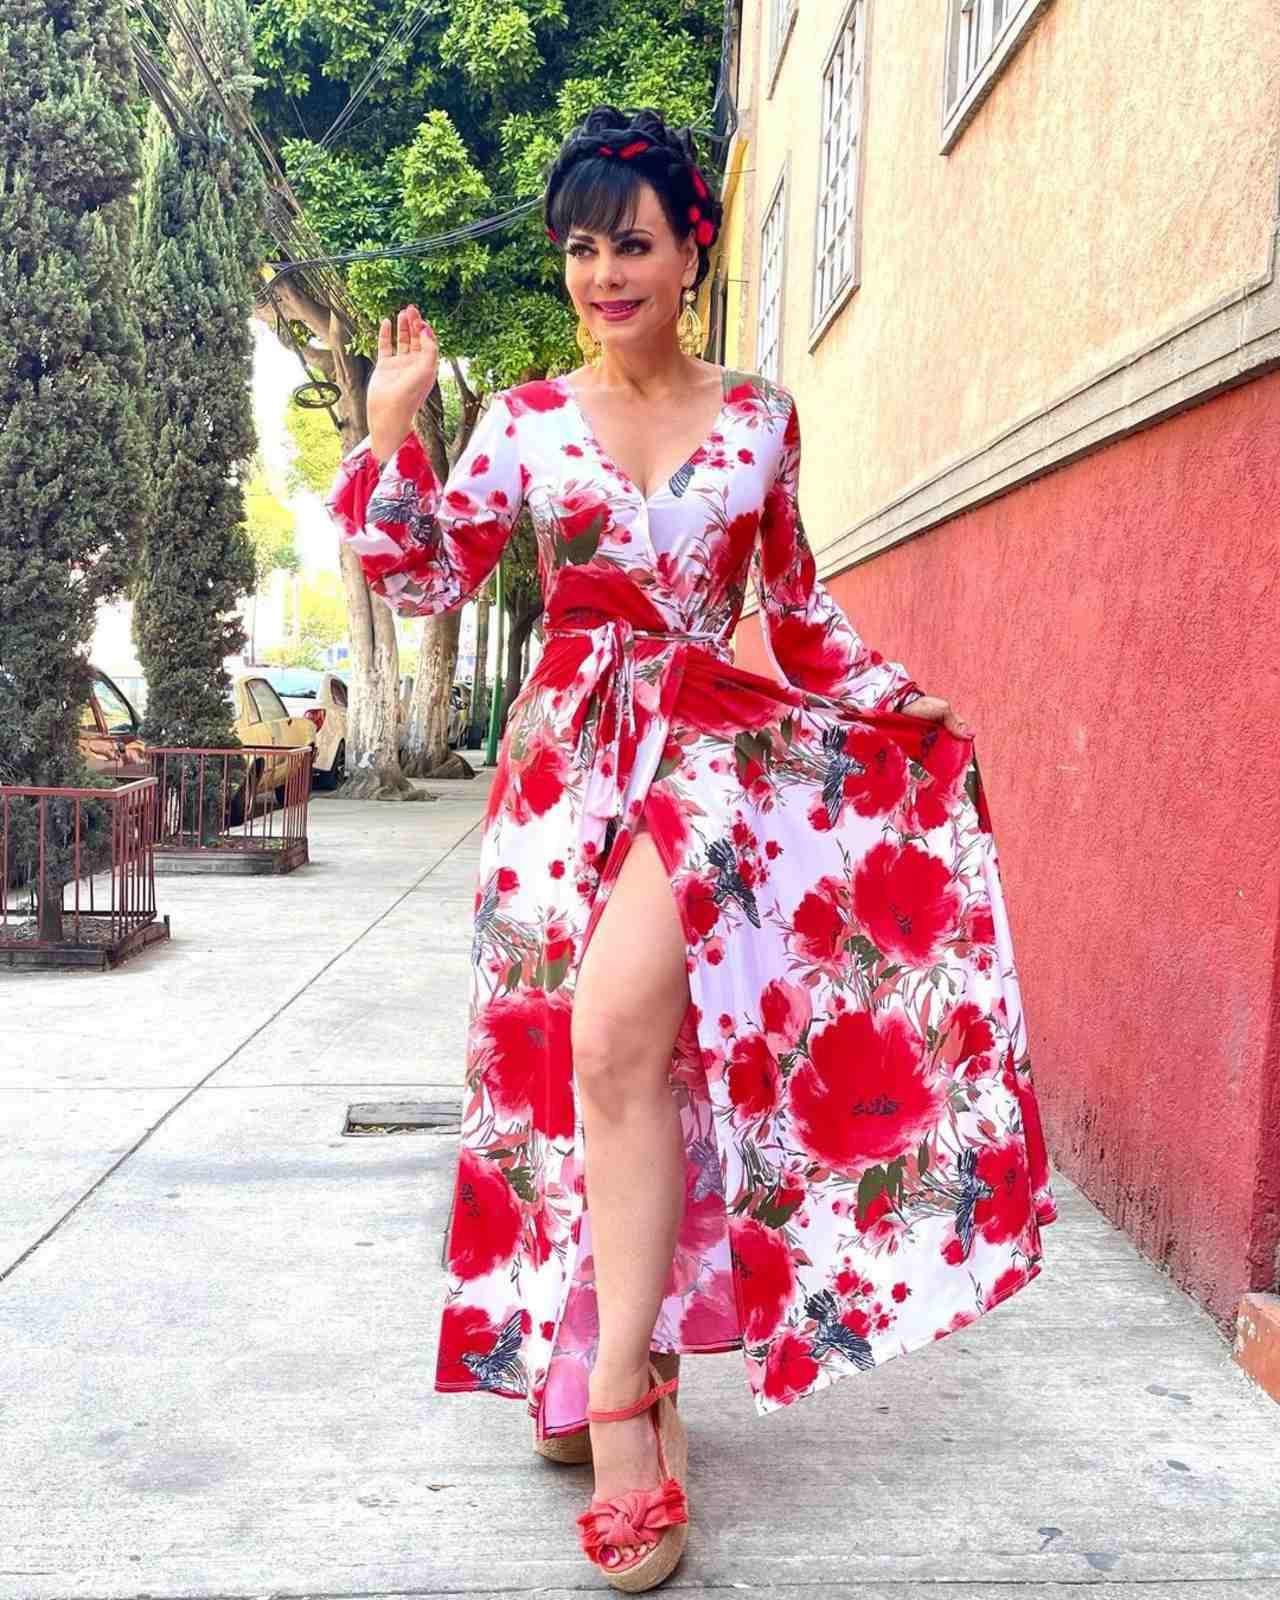 Maribel Guardia Rafael Inclán romance relación conquistó